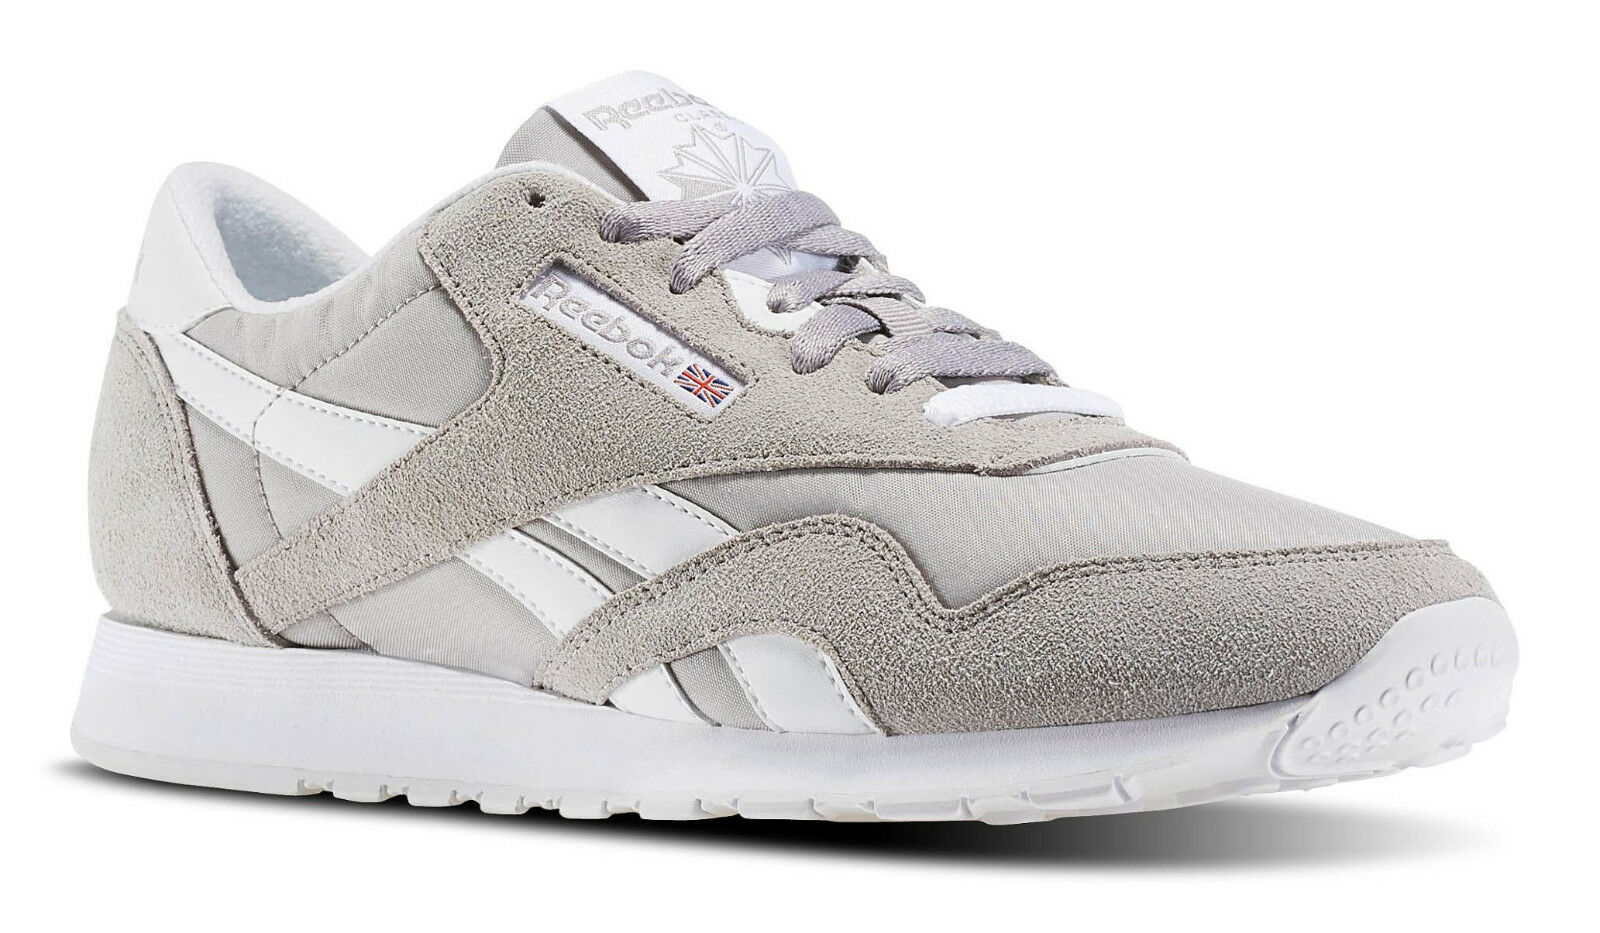 Reebok Classic Nylon Whispher Grey, White Mens Running Tennis Shoes